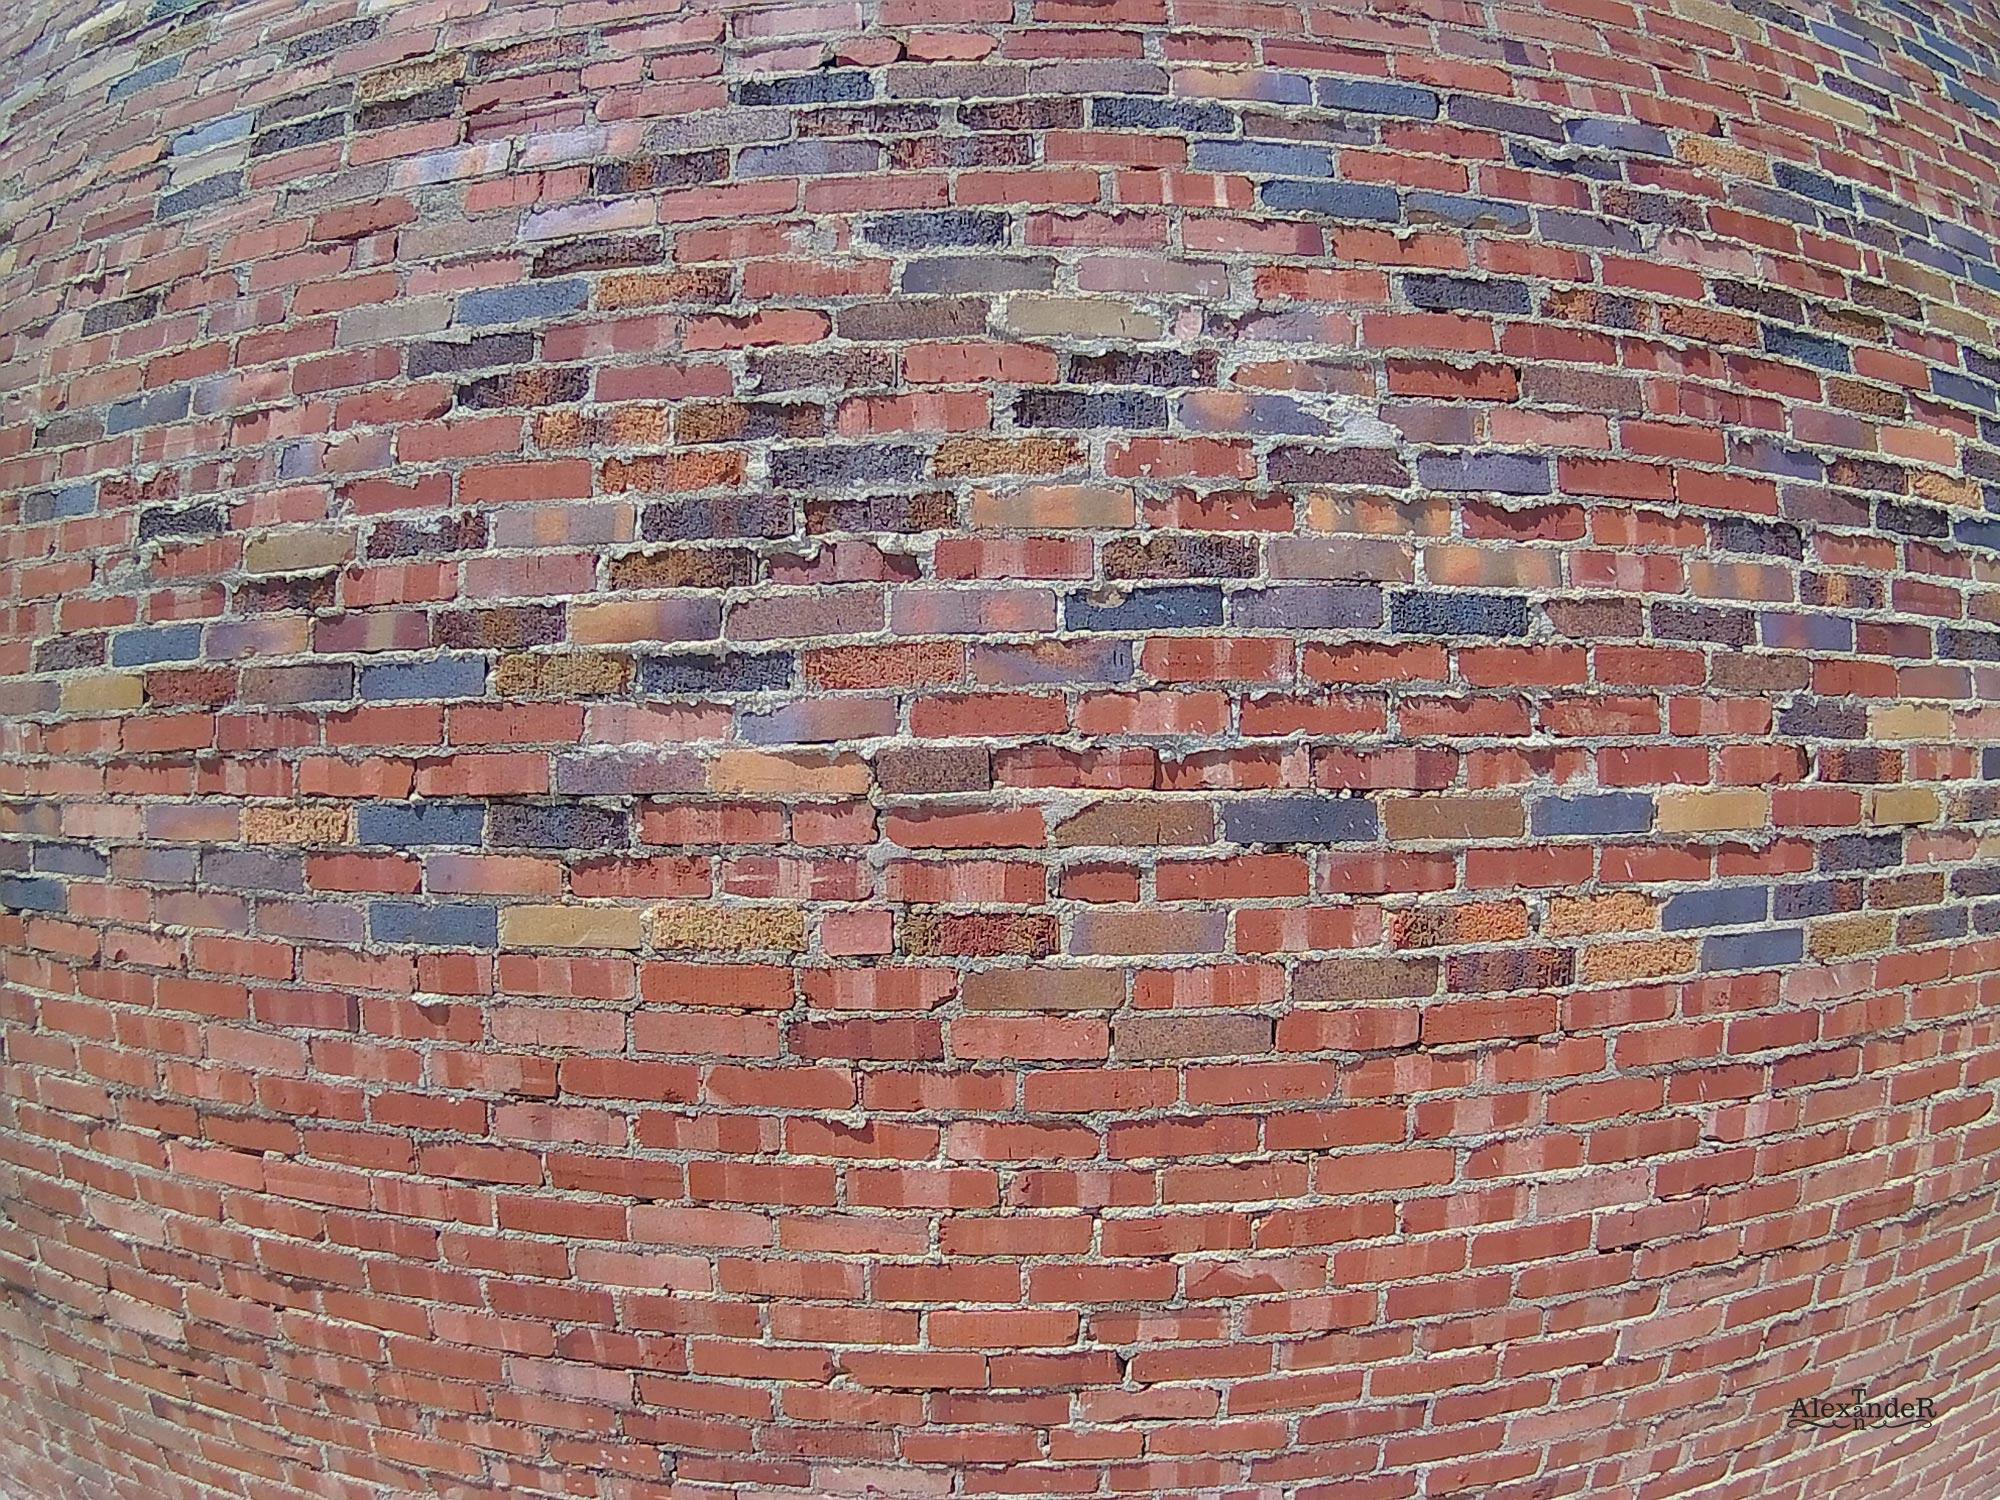 Brick Wall to Show Barrel distortion